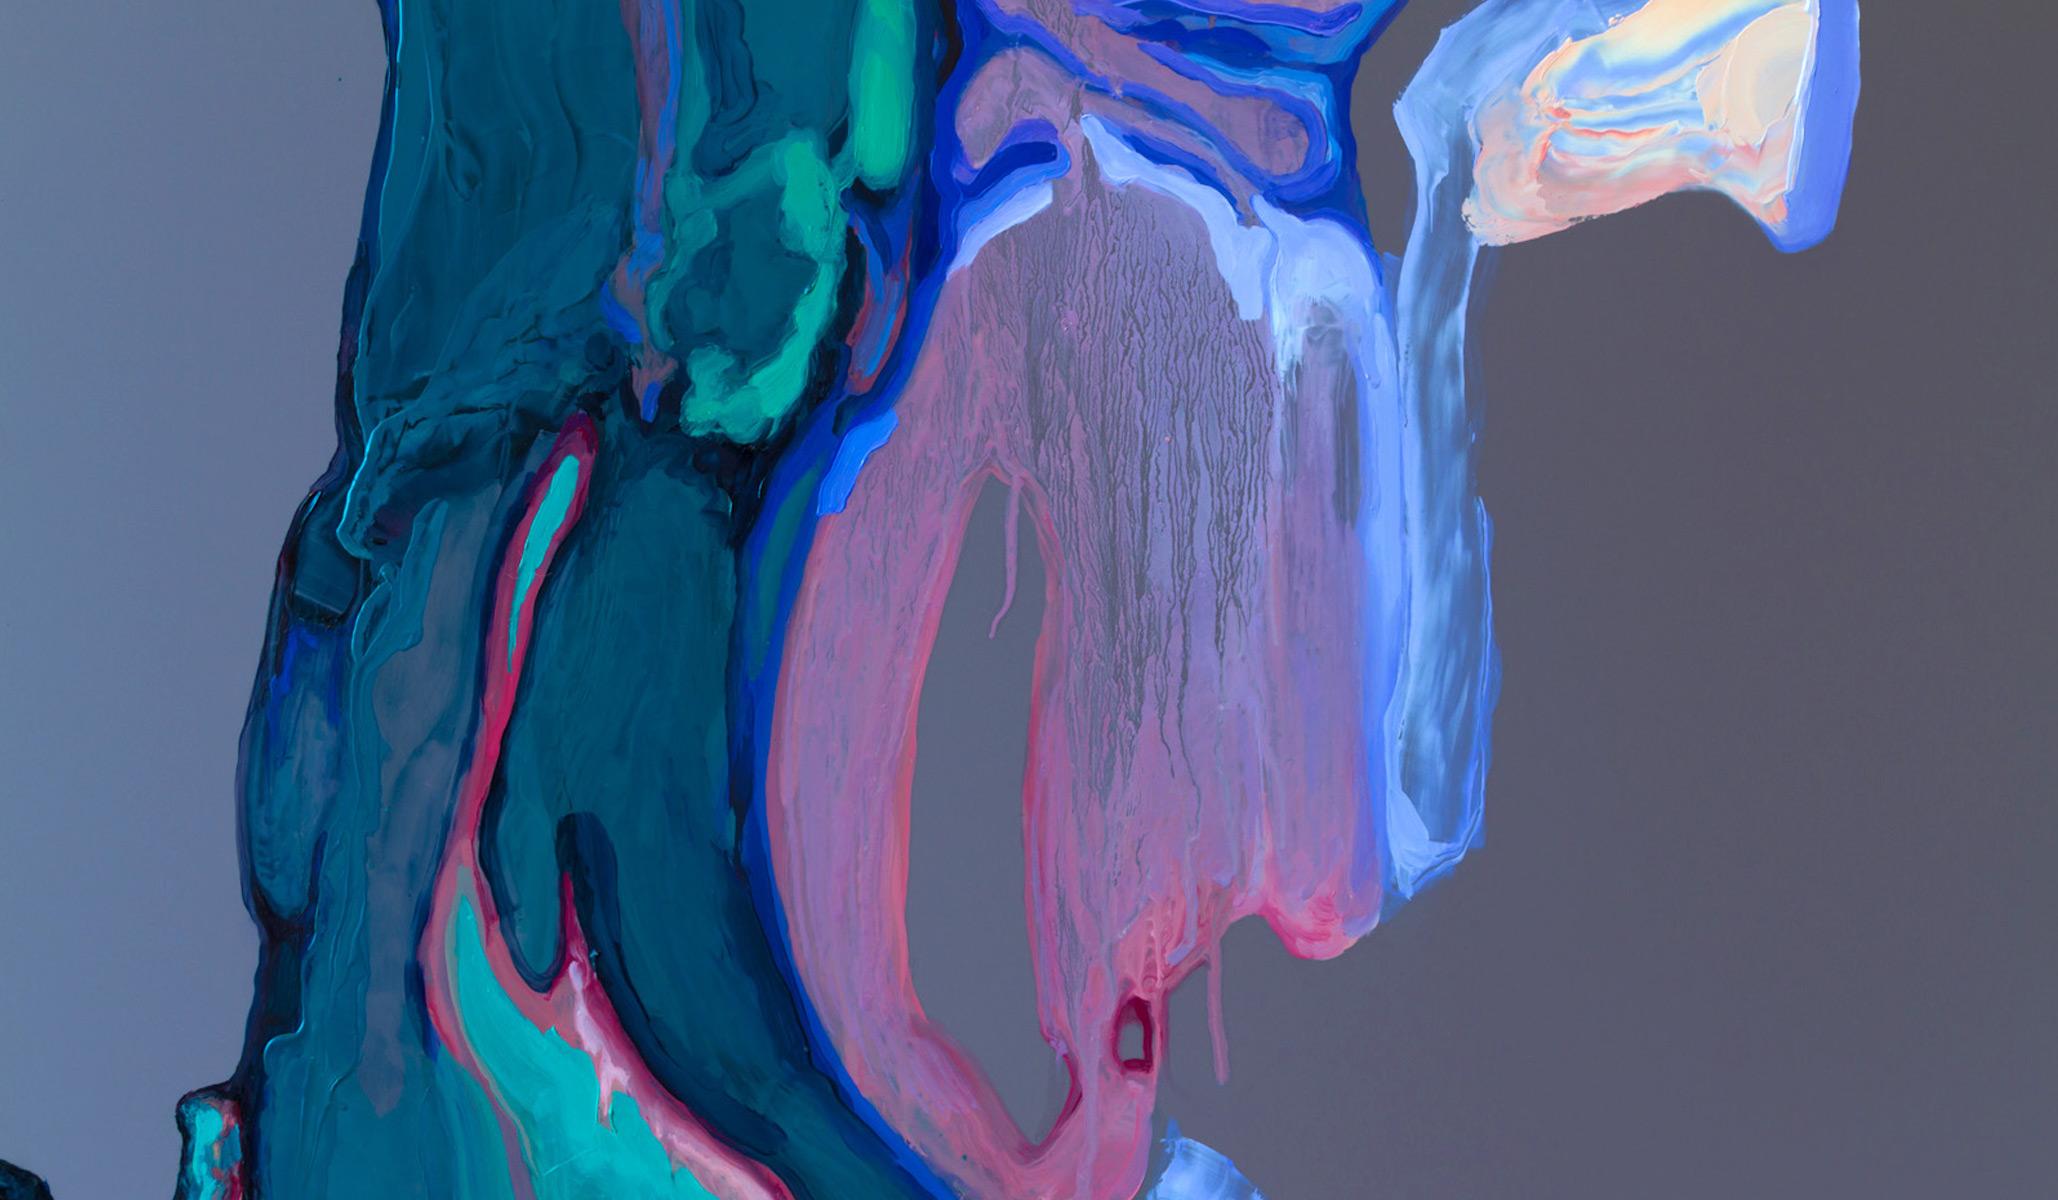 Artereal_Gallery_2016_XII_Jess_MacNeil_Unfound_doco_15_TheFamiliarStrange_detail